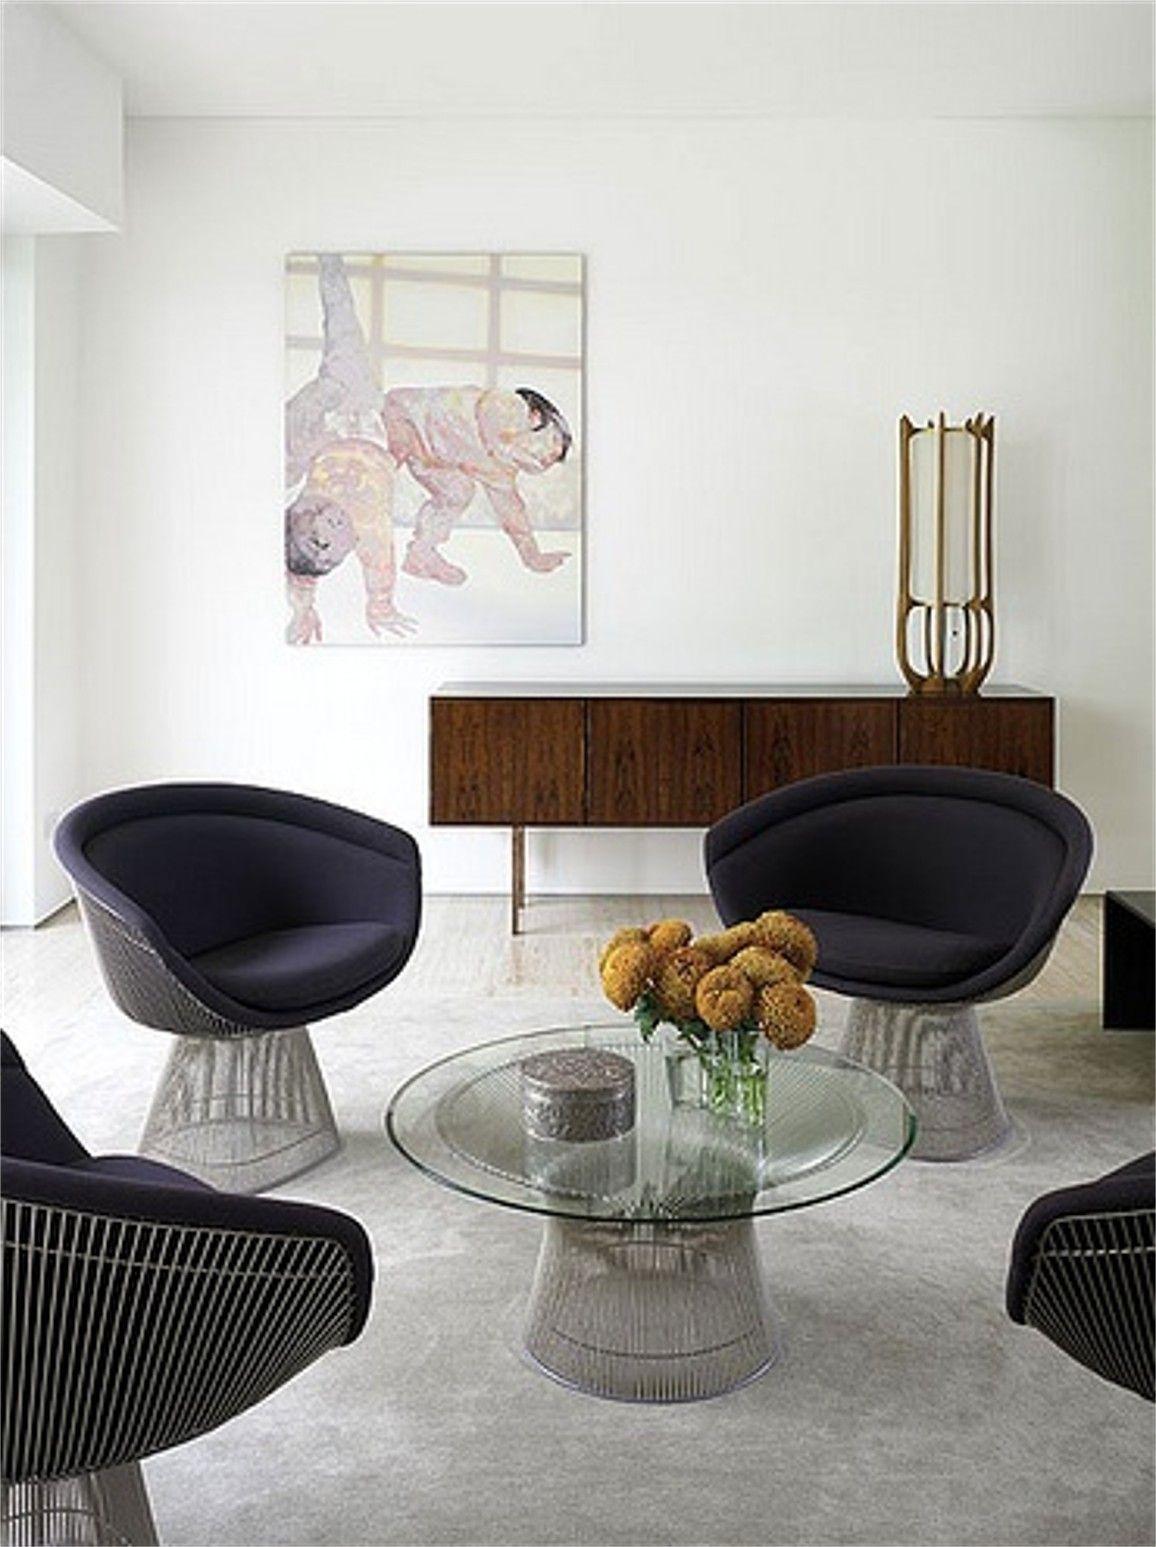 mid century modern interior design | Interior Design